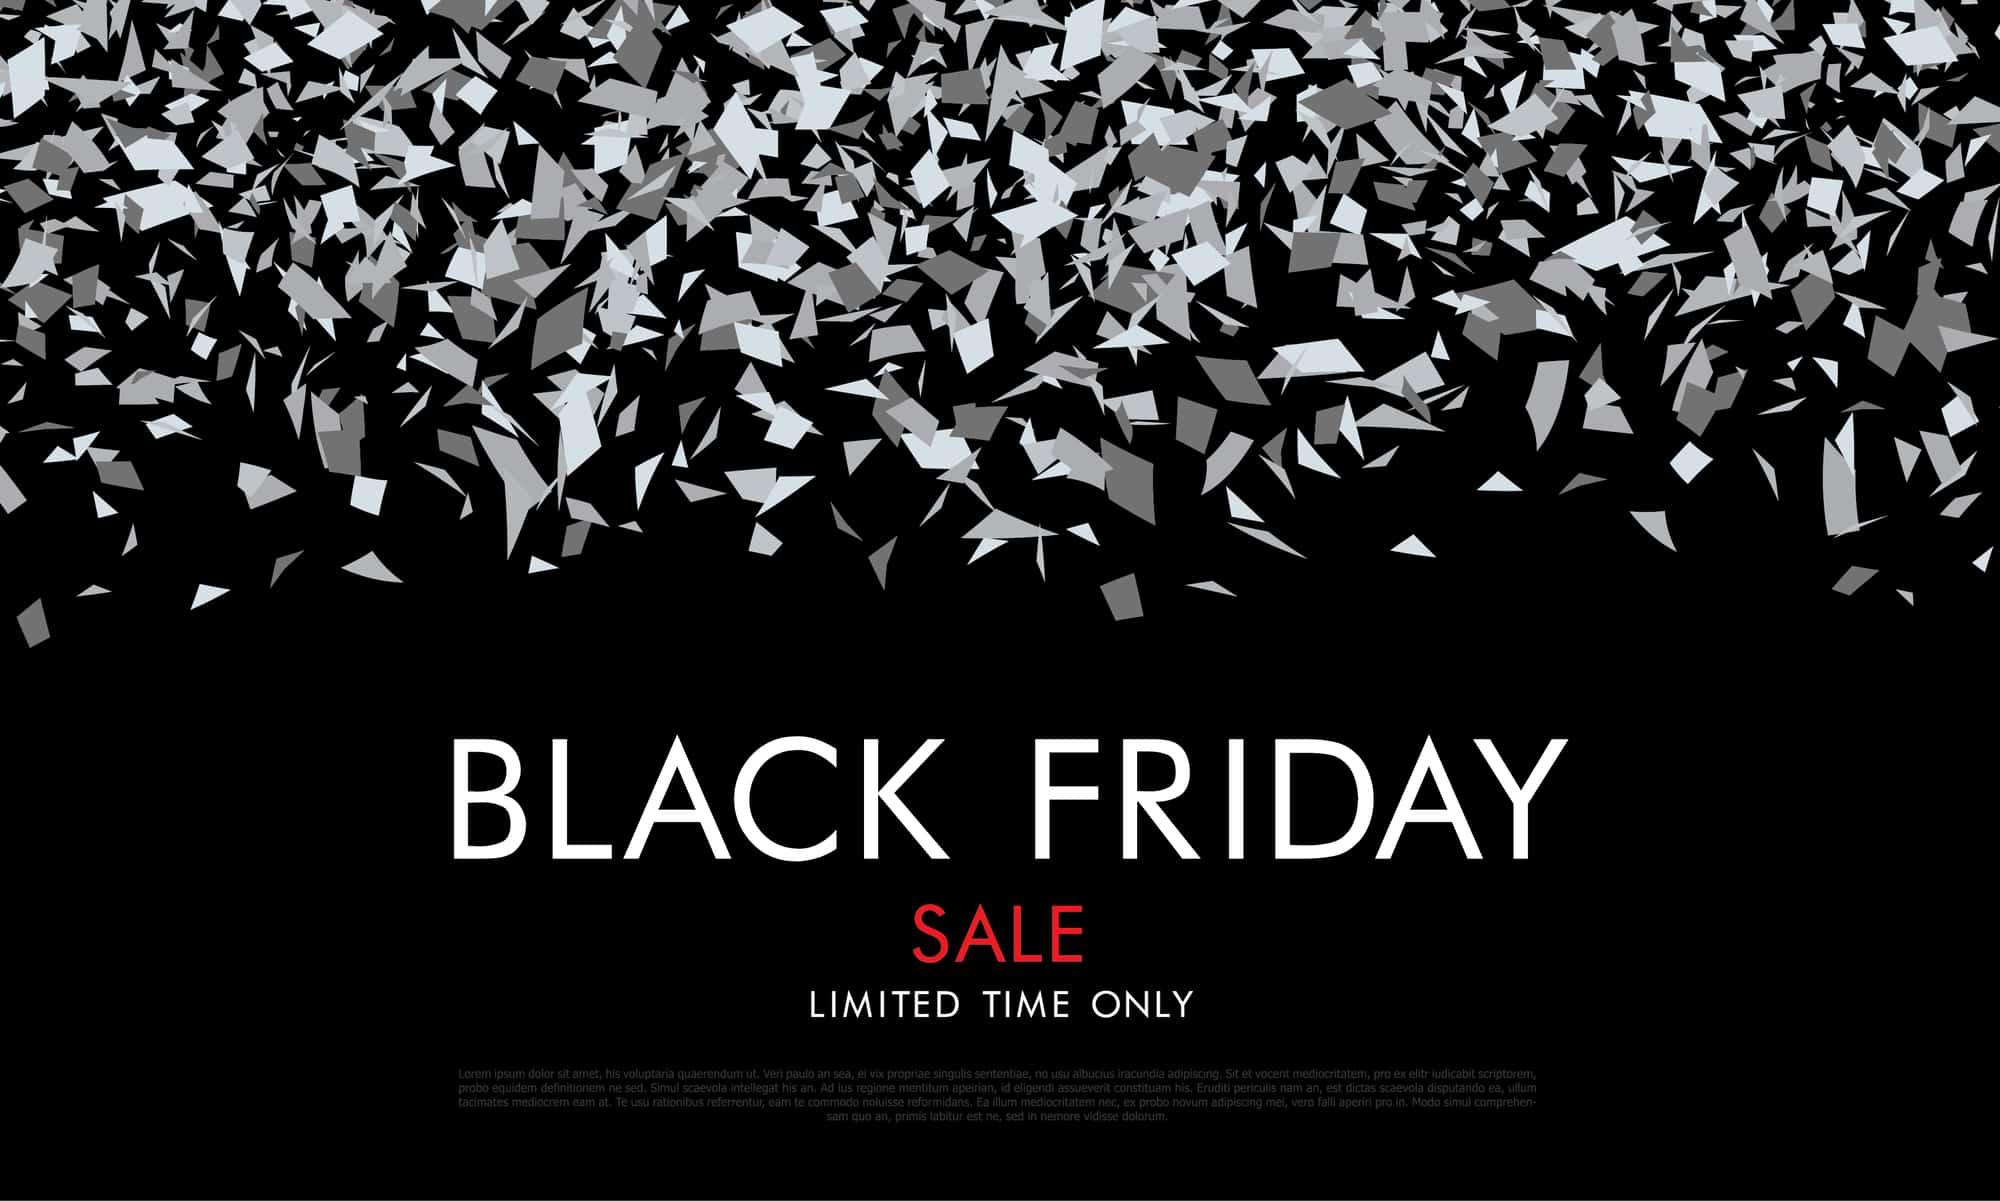 Black Friday mattress sale